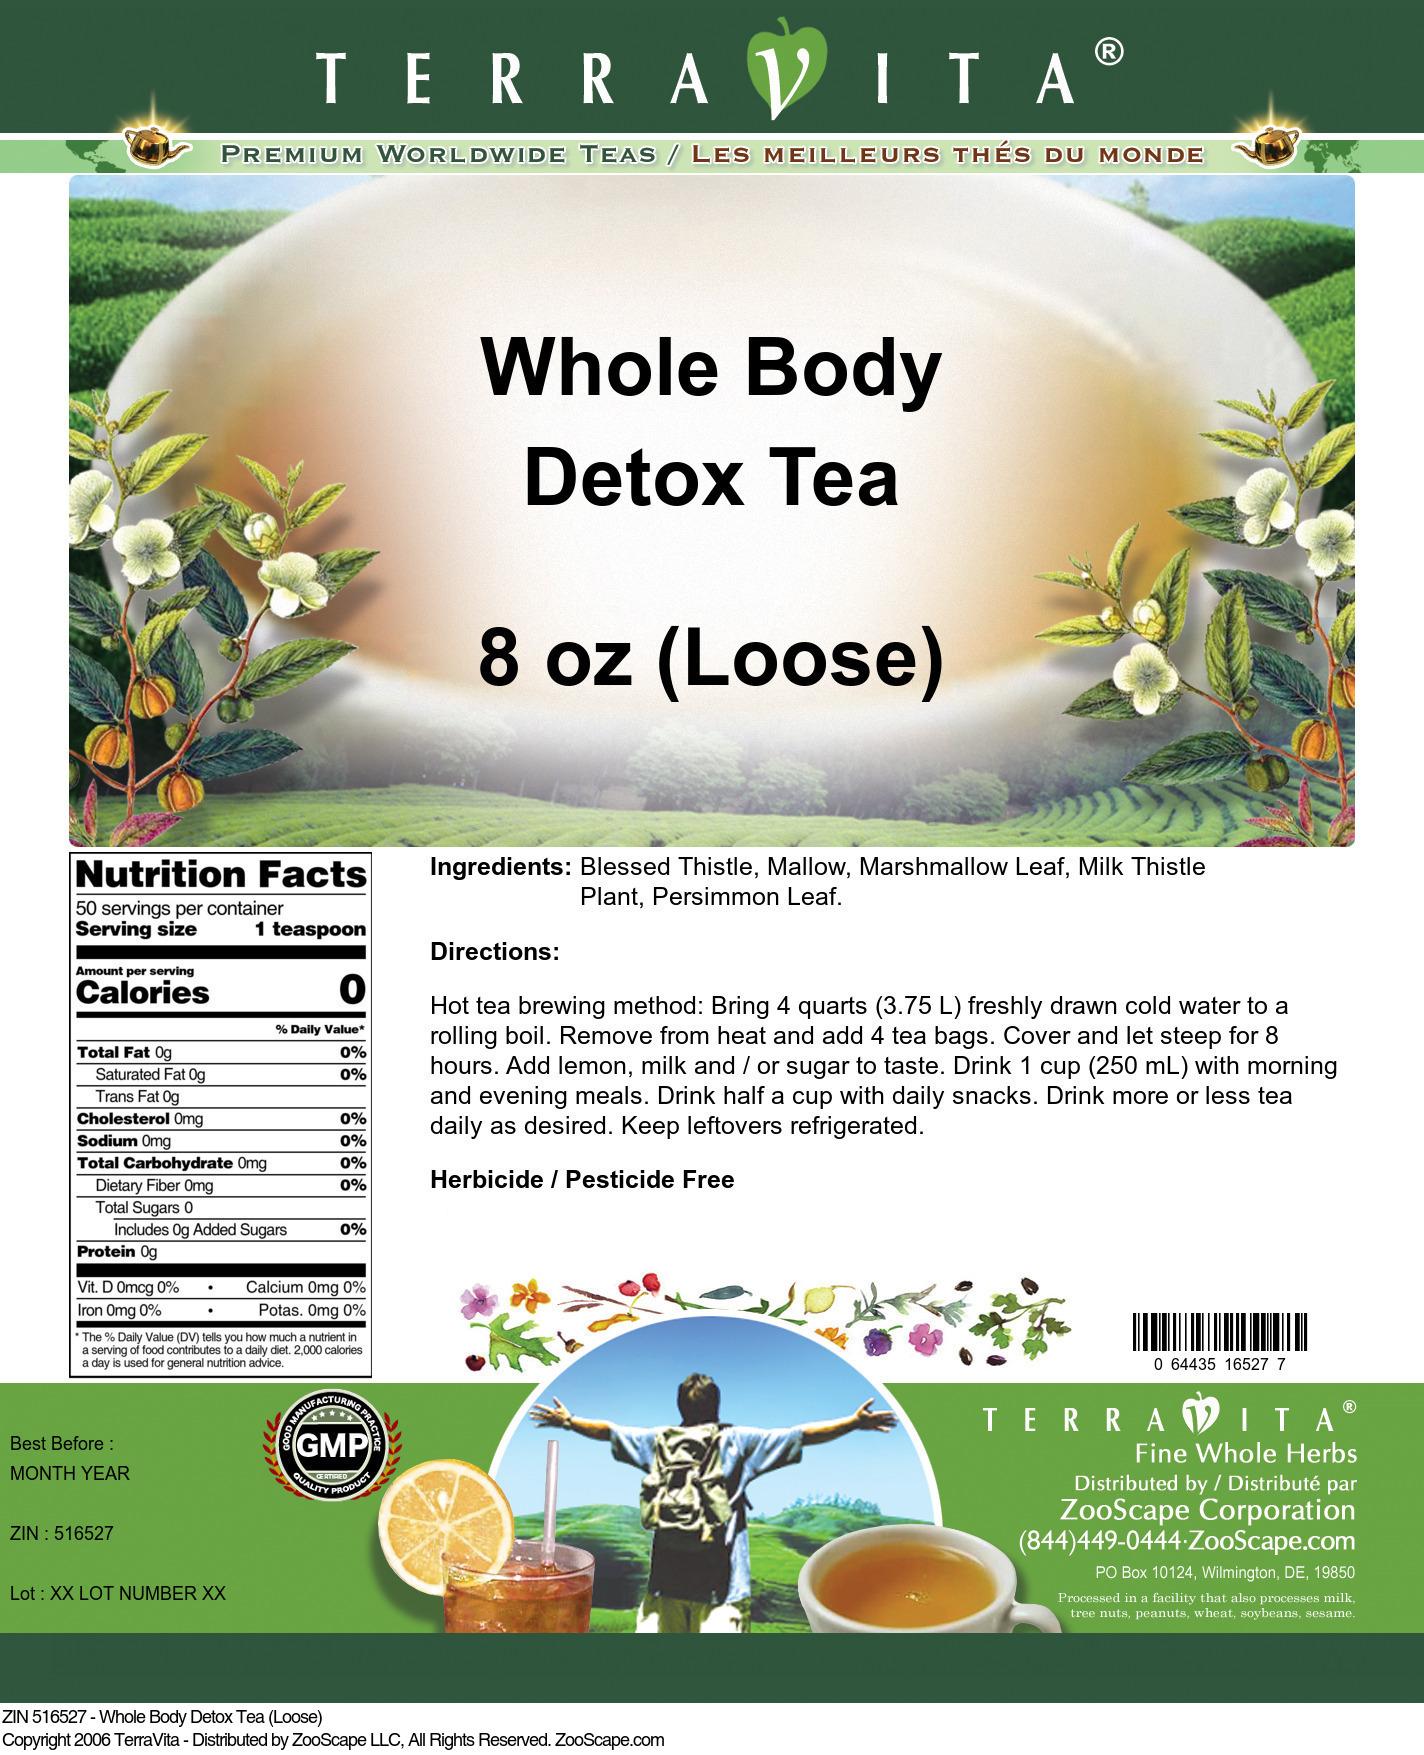 Whole Body Detox Tea (Loose)